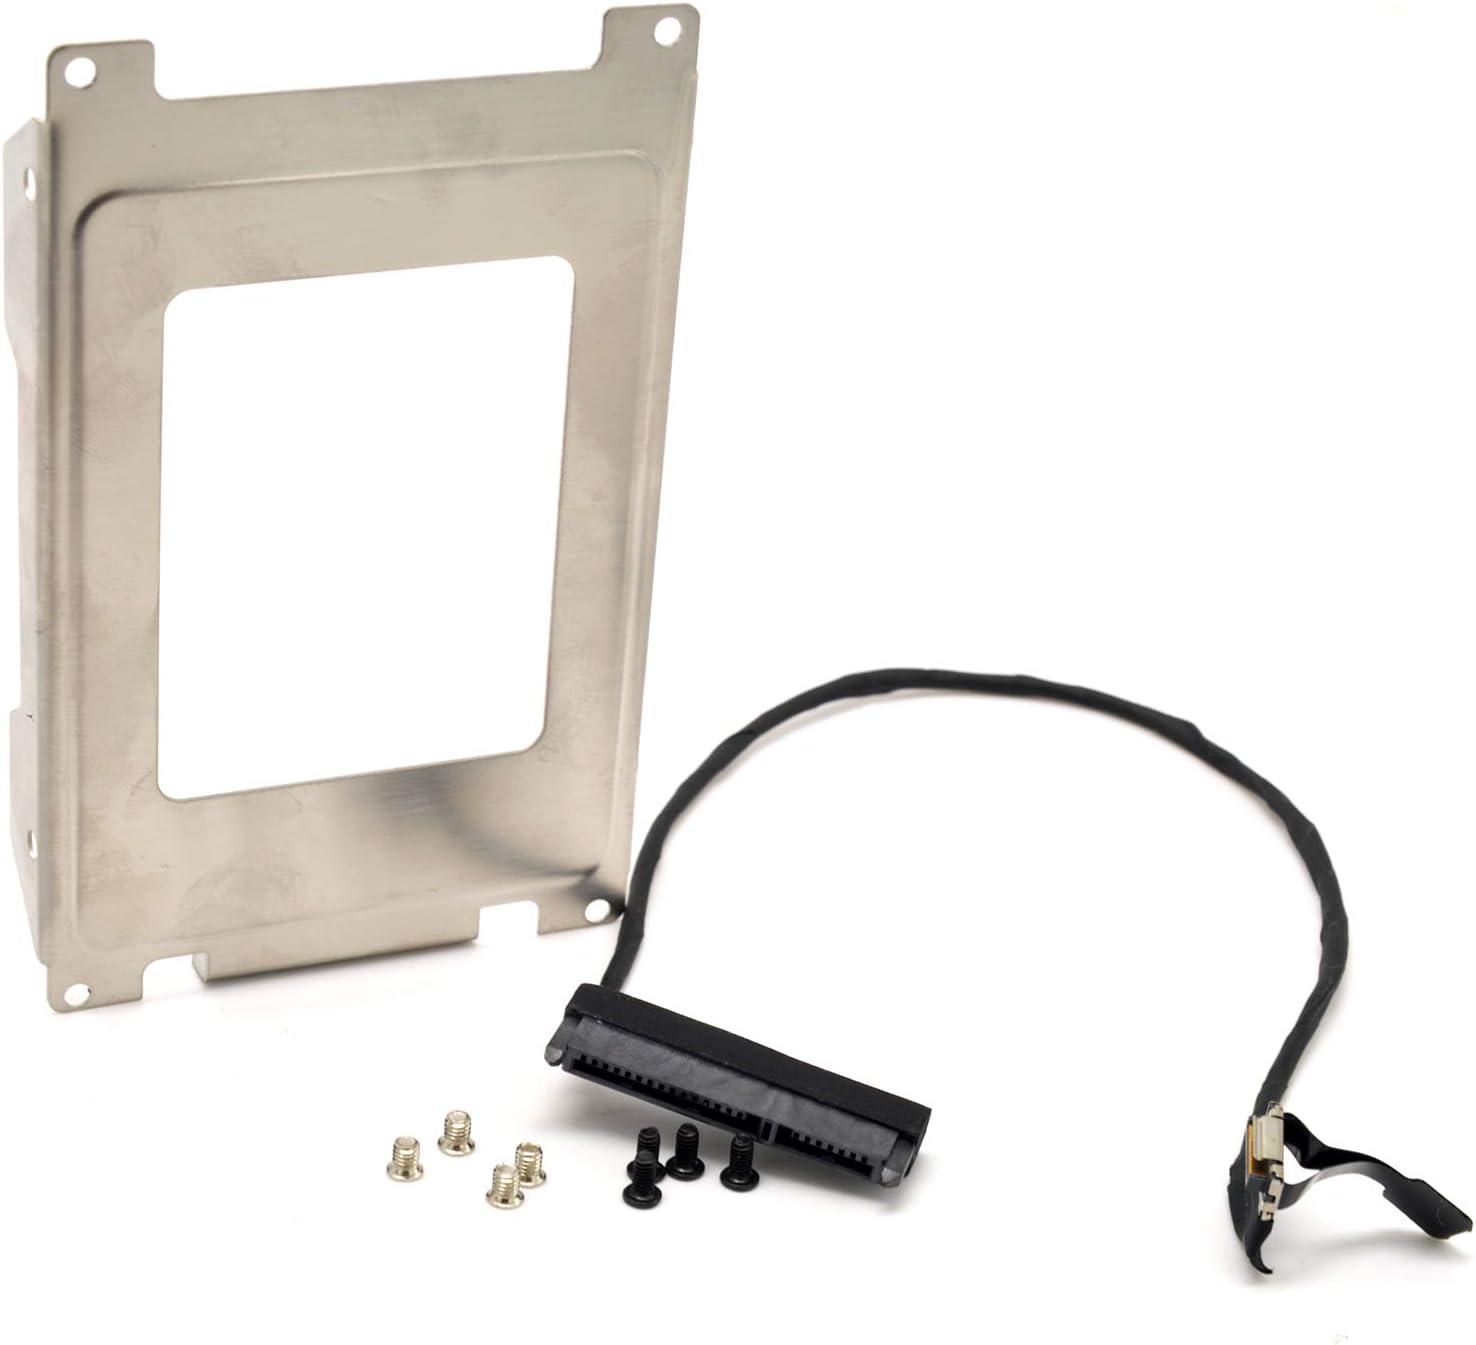 Deal4GO 2nd Second SSD HDD Hard Drive Caddy Mounting Bracket with SATA Cable Long for HP Pavilion DV7-6000 DV7-6xxx DV7-61xx DV7-6Bxx DV7-6Cxx DV7T-6000